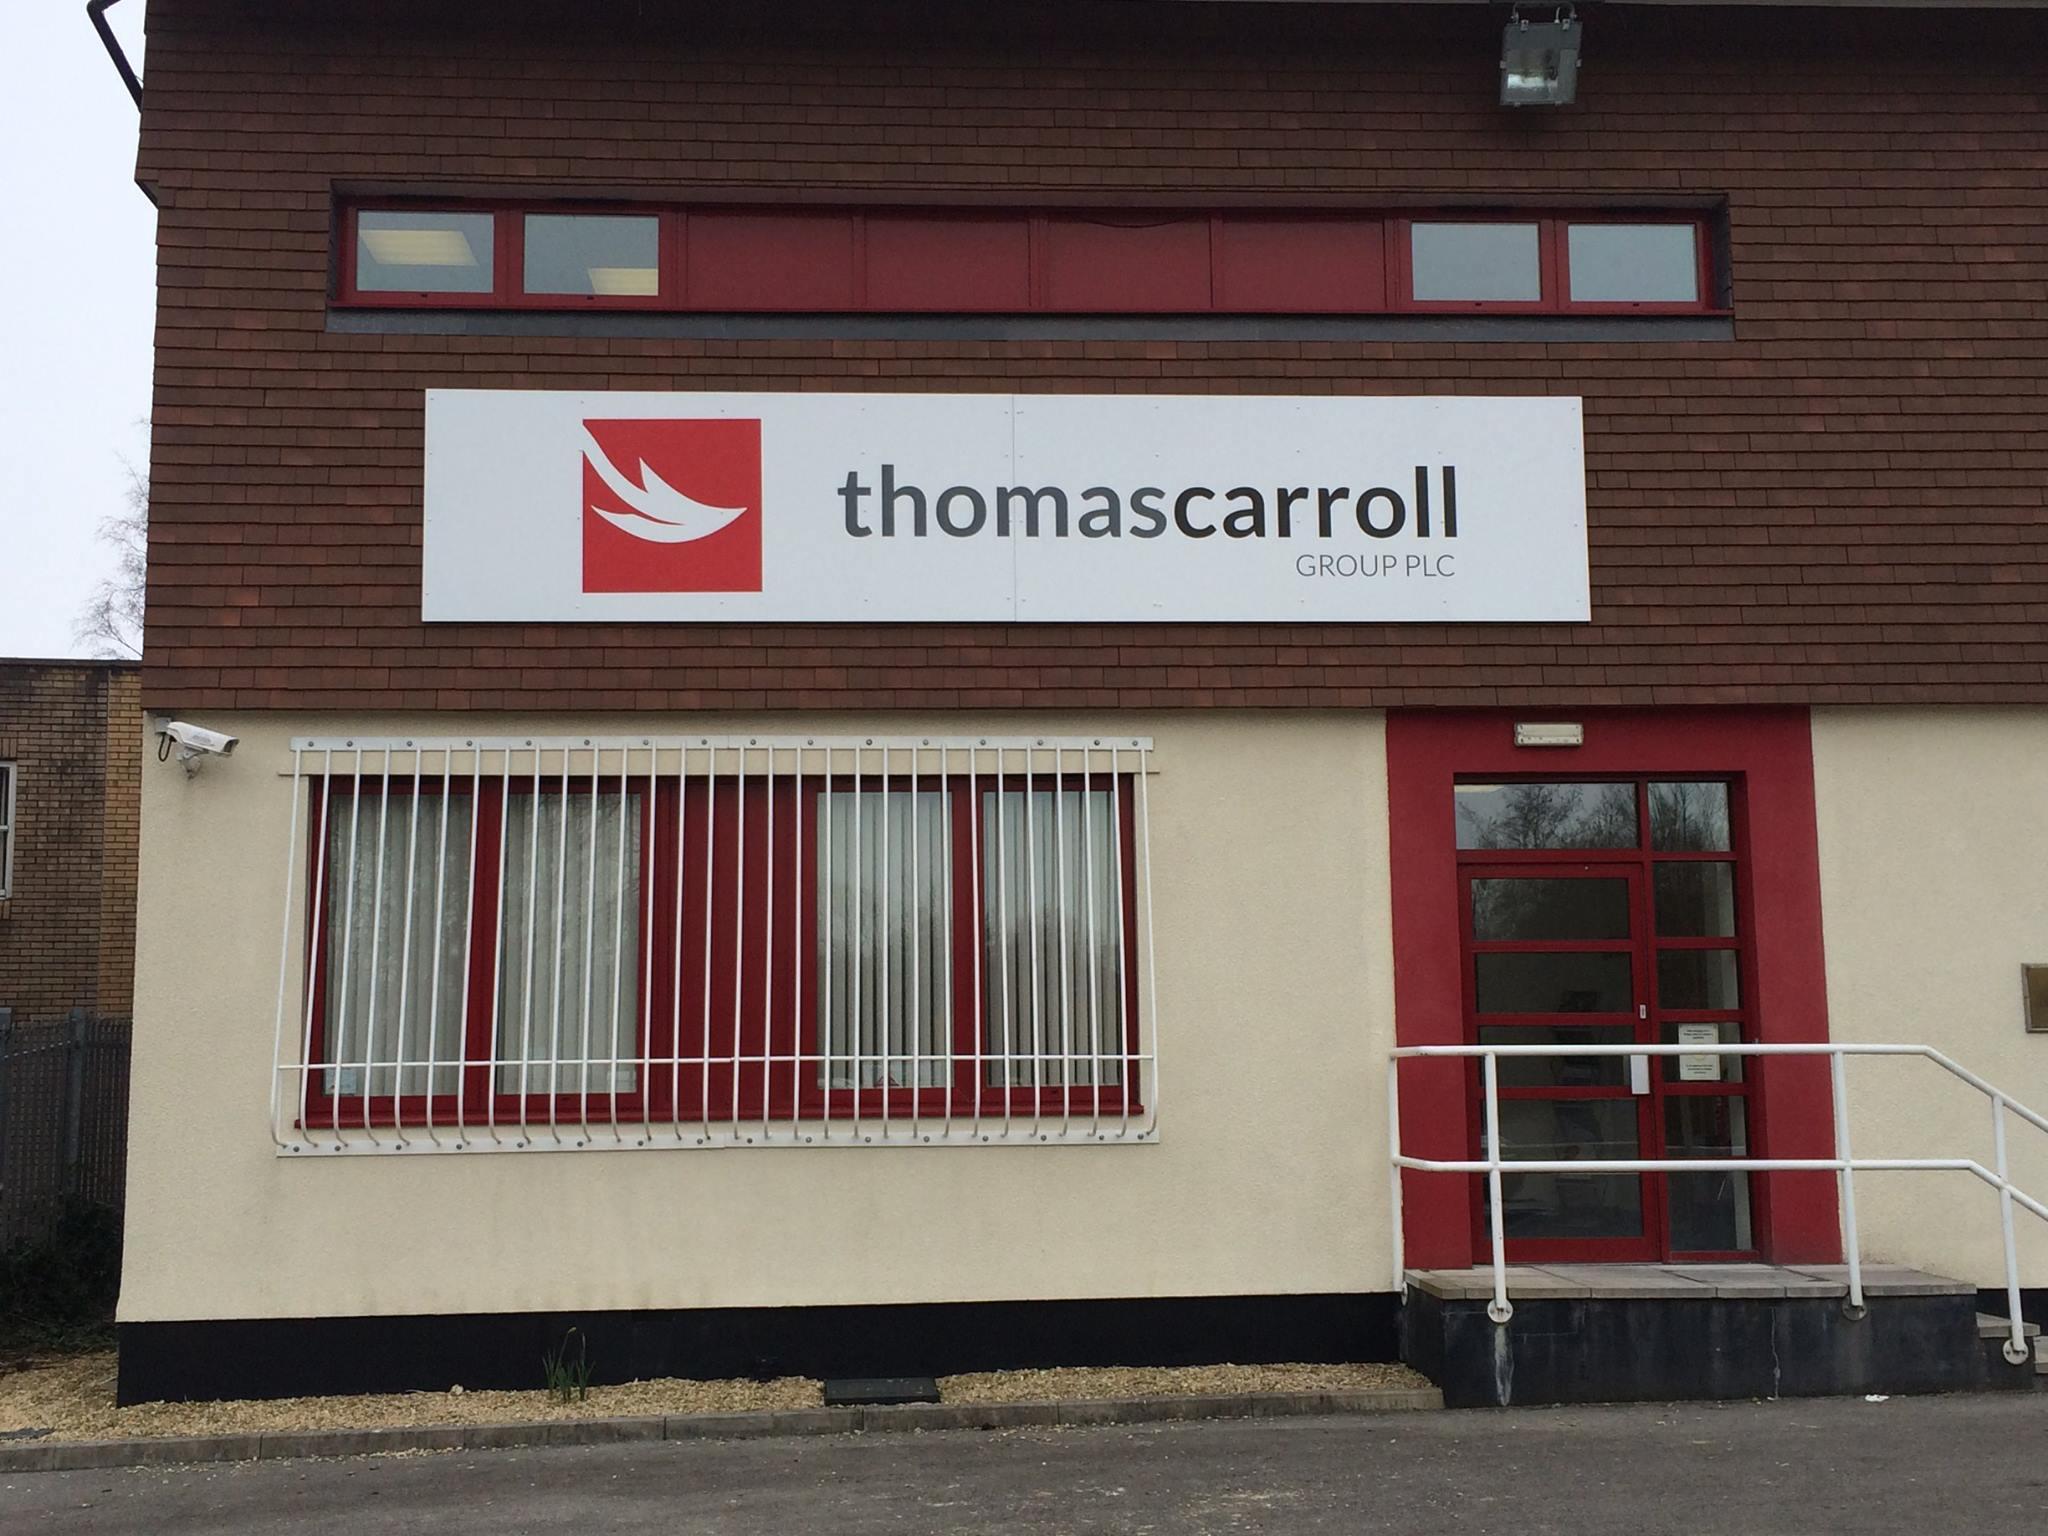 Thomas-Carroll-exterior-signage.jpg